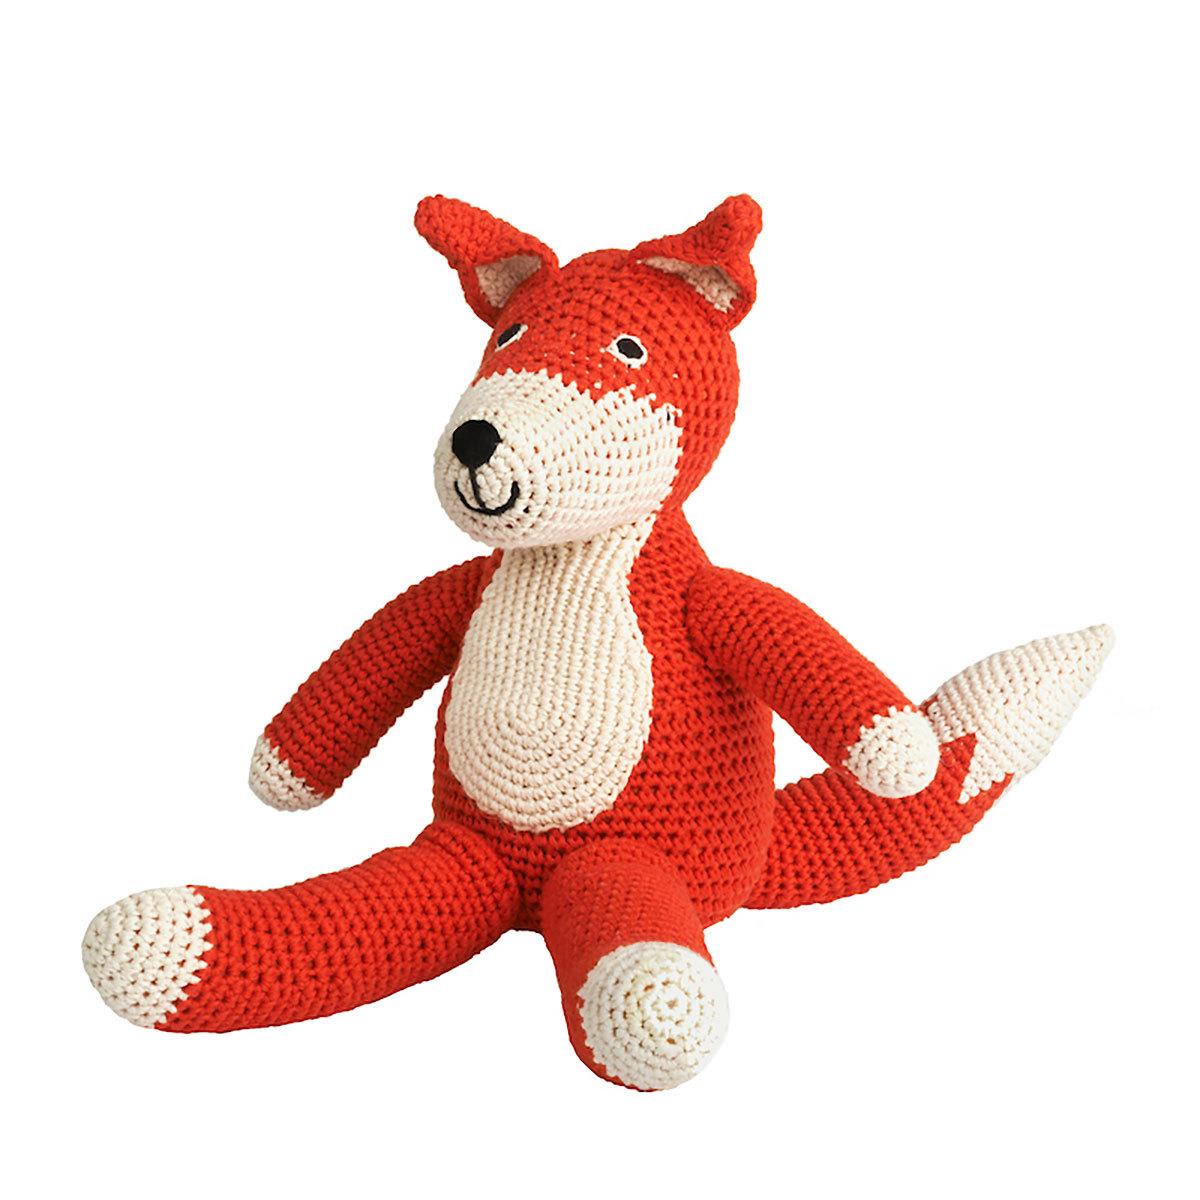 Peluche Peluche Renard en Crochet 21 cm Peluche Renard en Crochet 21 cm